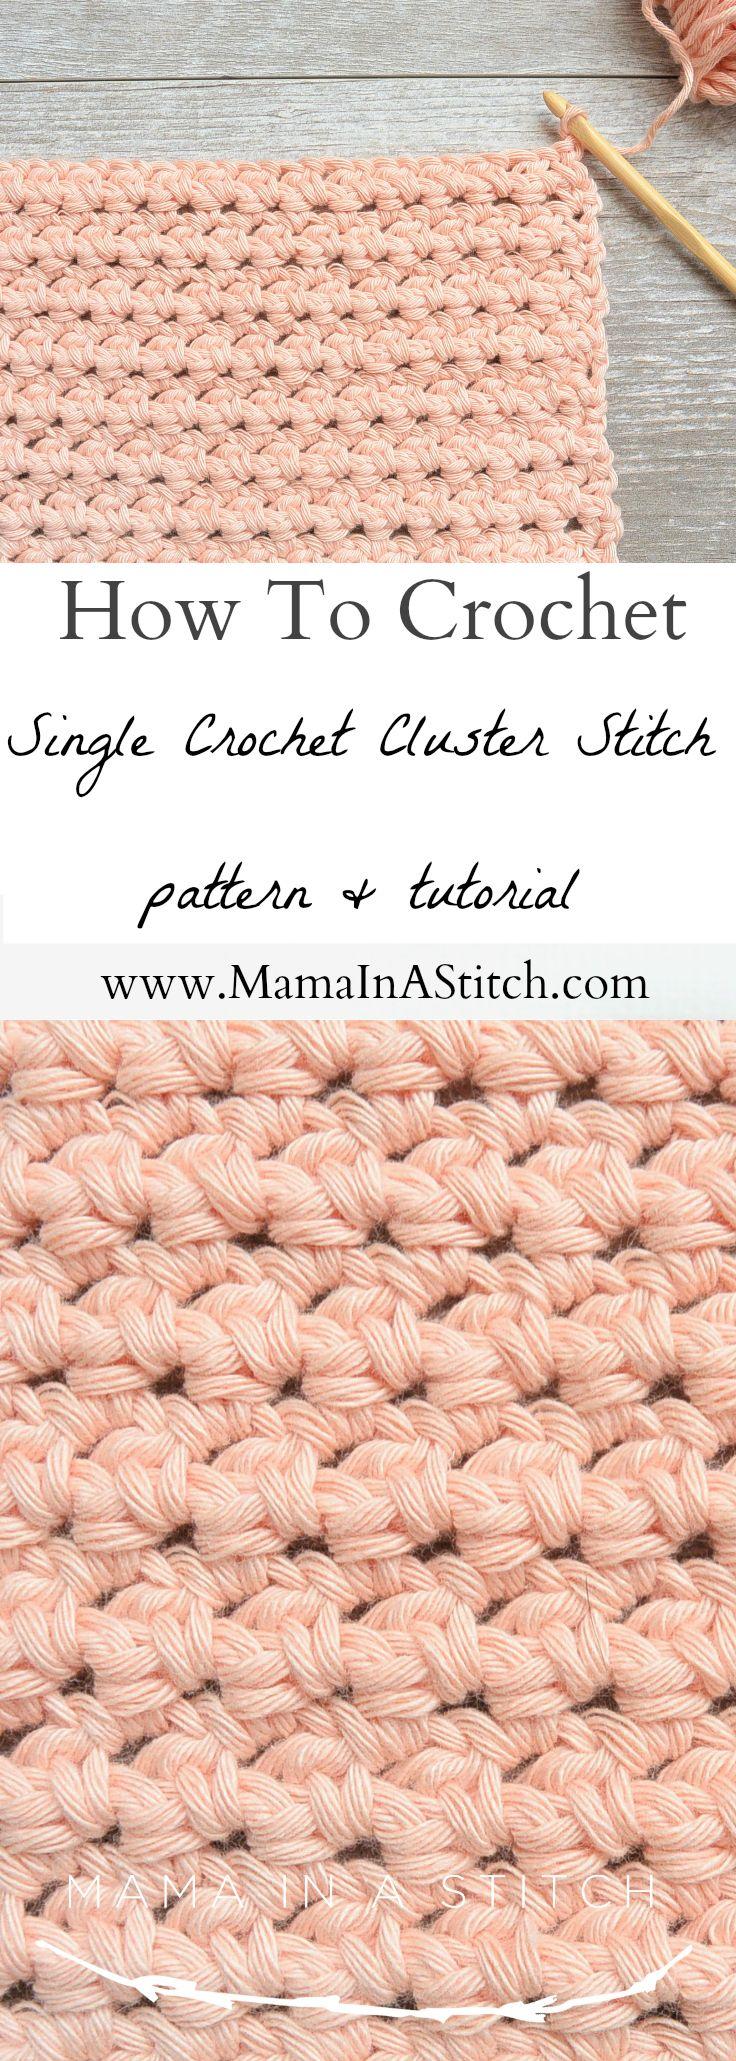 How To Crochet the Single Crochet Cluster Stitch | Häkeln ...